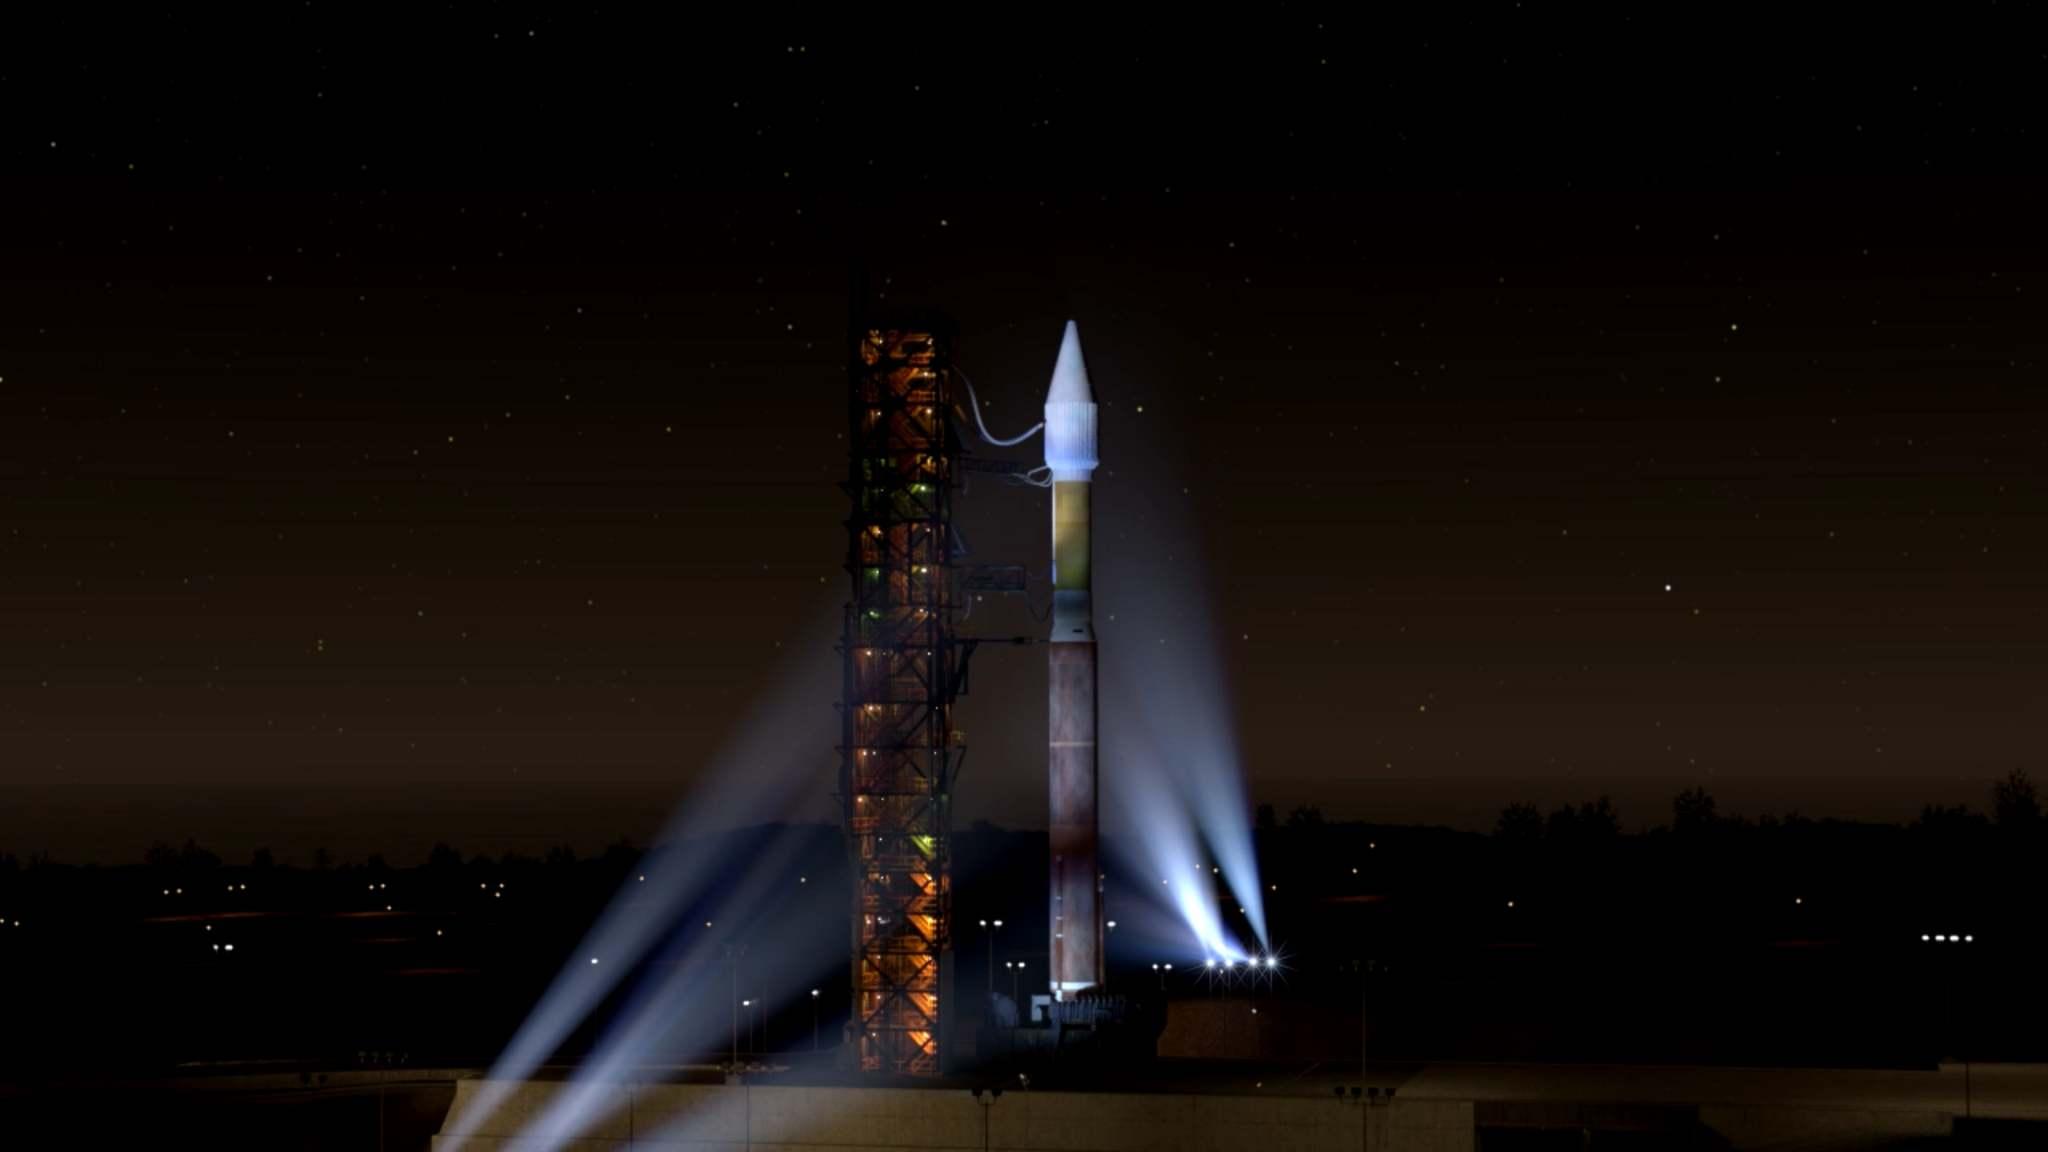 InSight's Launch